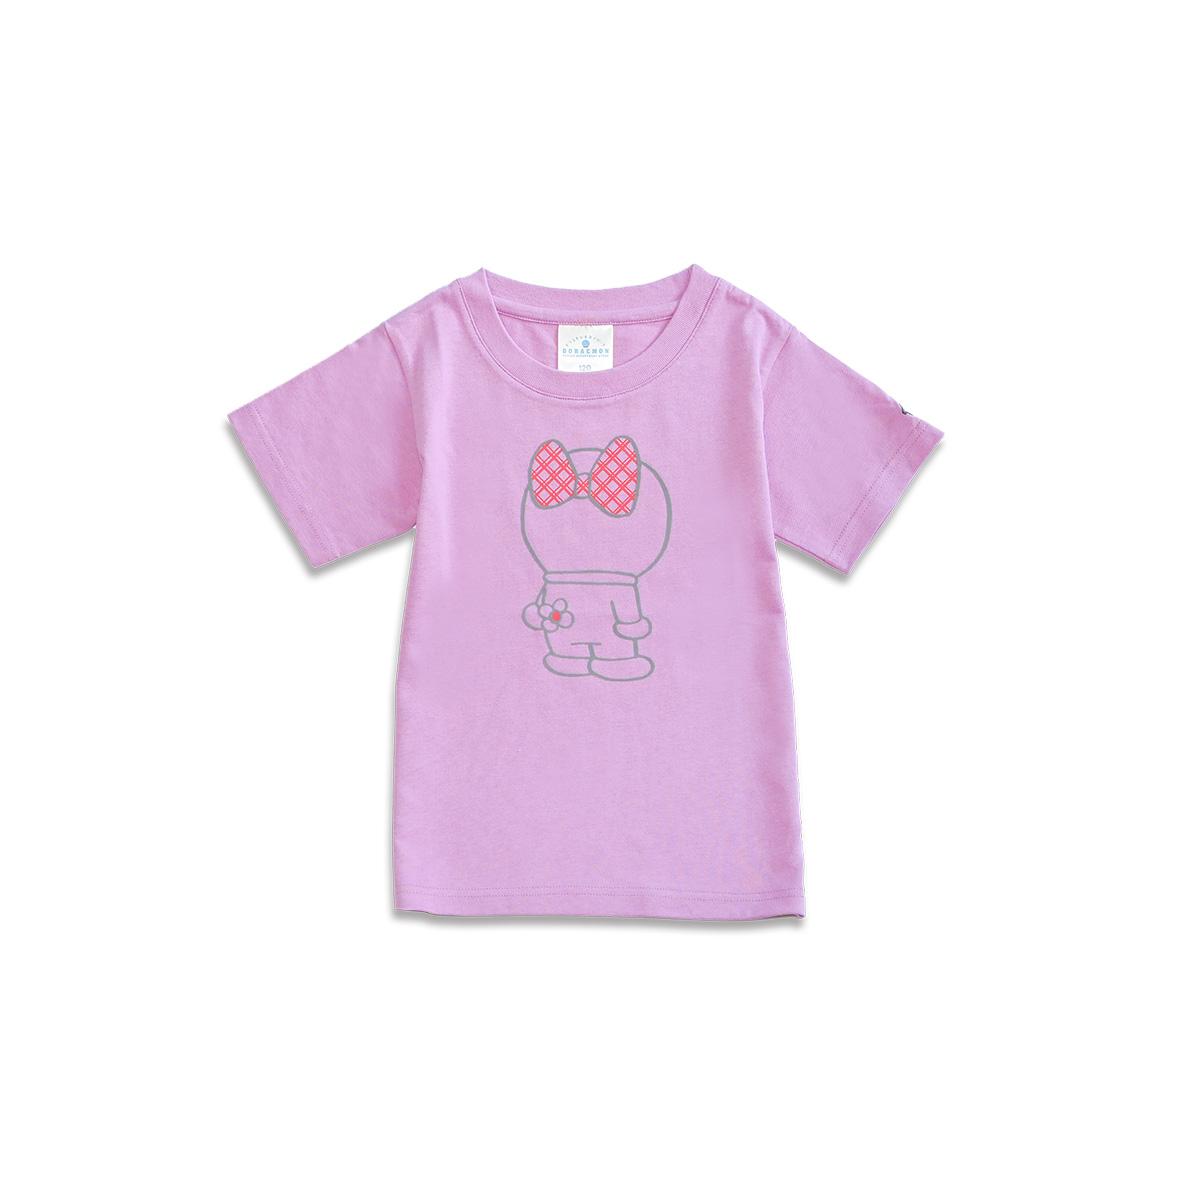 Tシャツ ドラミ後ろすがた ピンク120